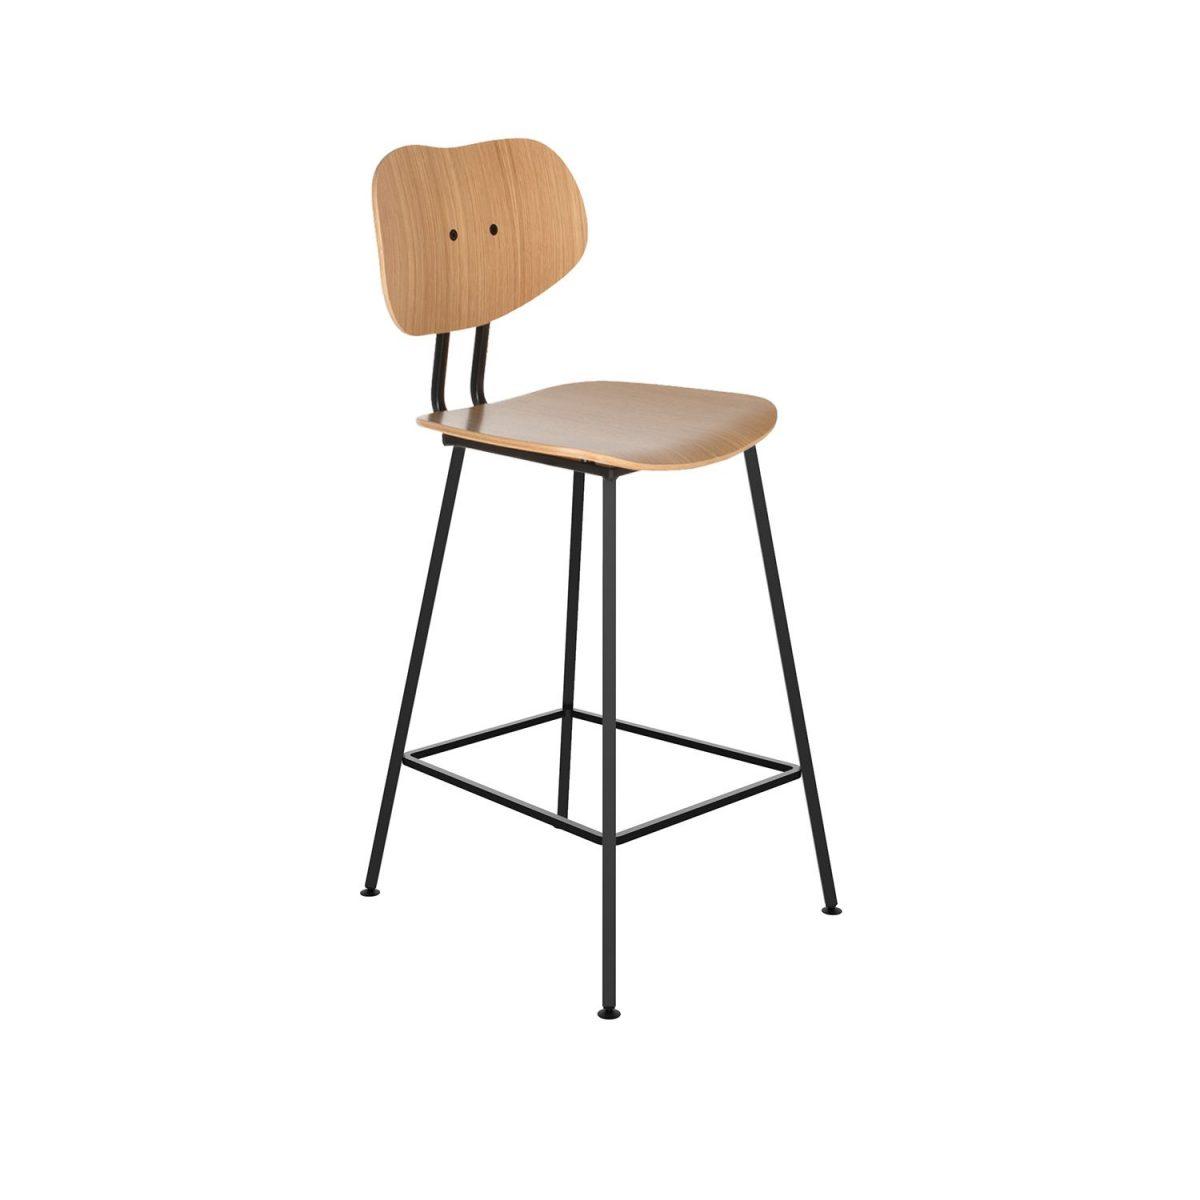 Maarten Baas Barstoel Lensvelt Dutch Design Hout